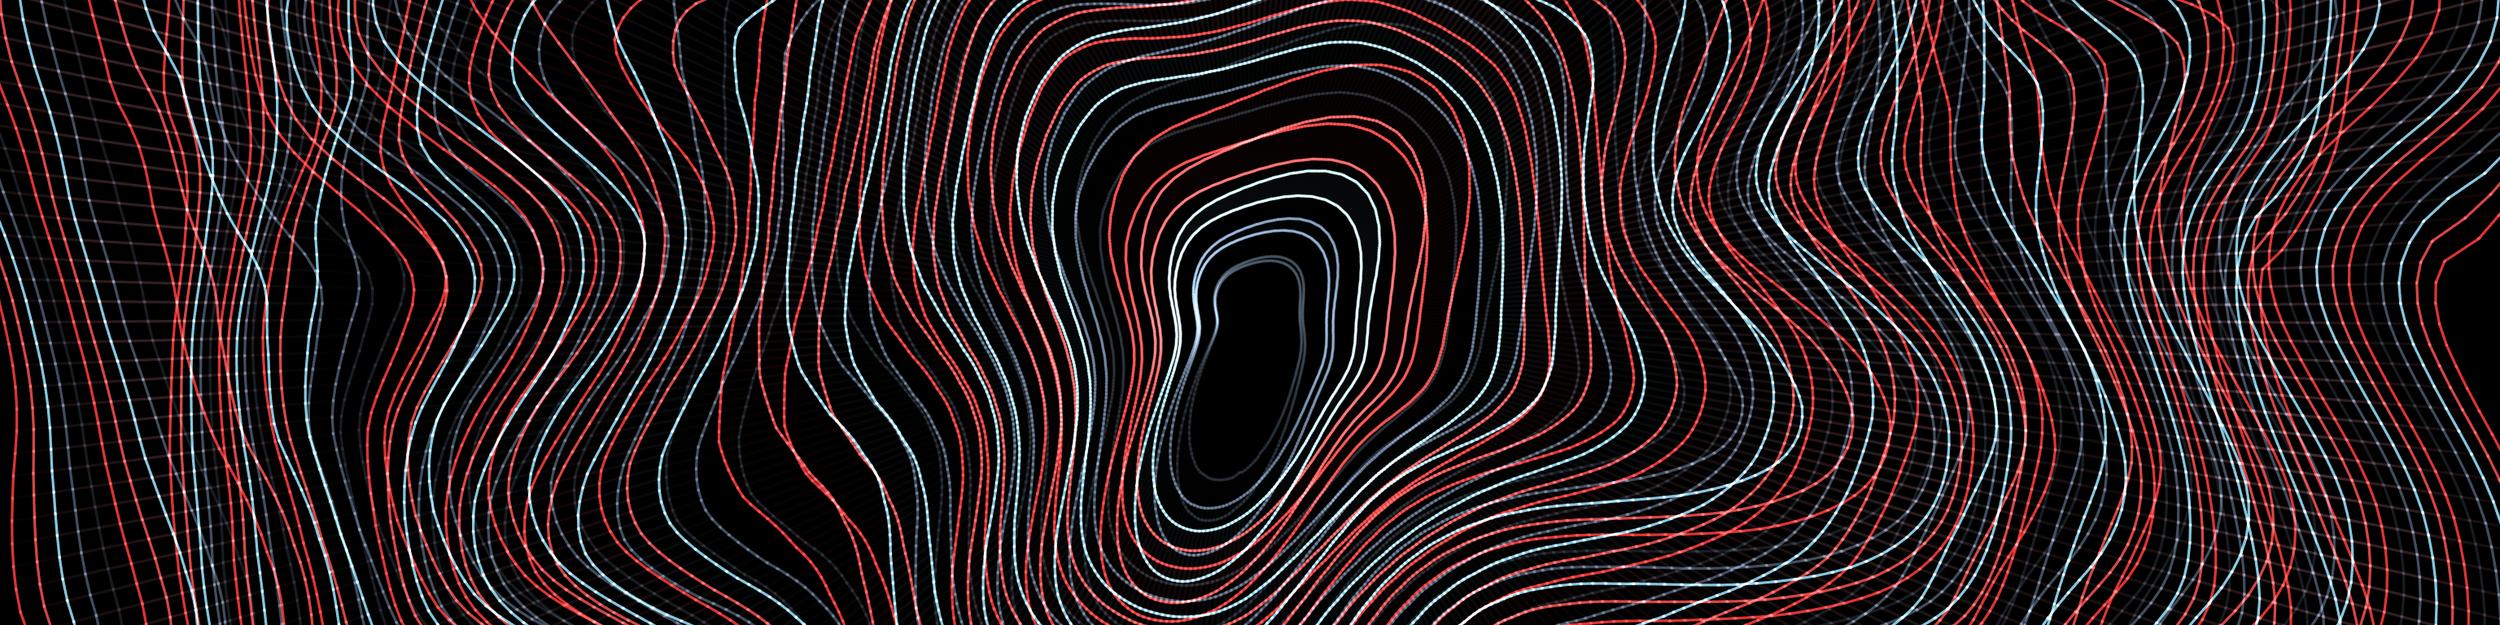 NoiseFormLayer 2014-09-11-16-55-42-155.png